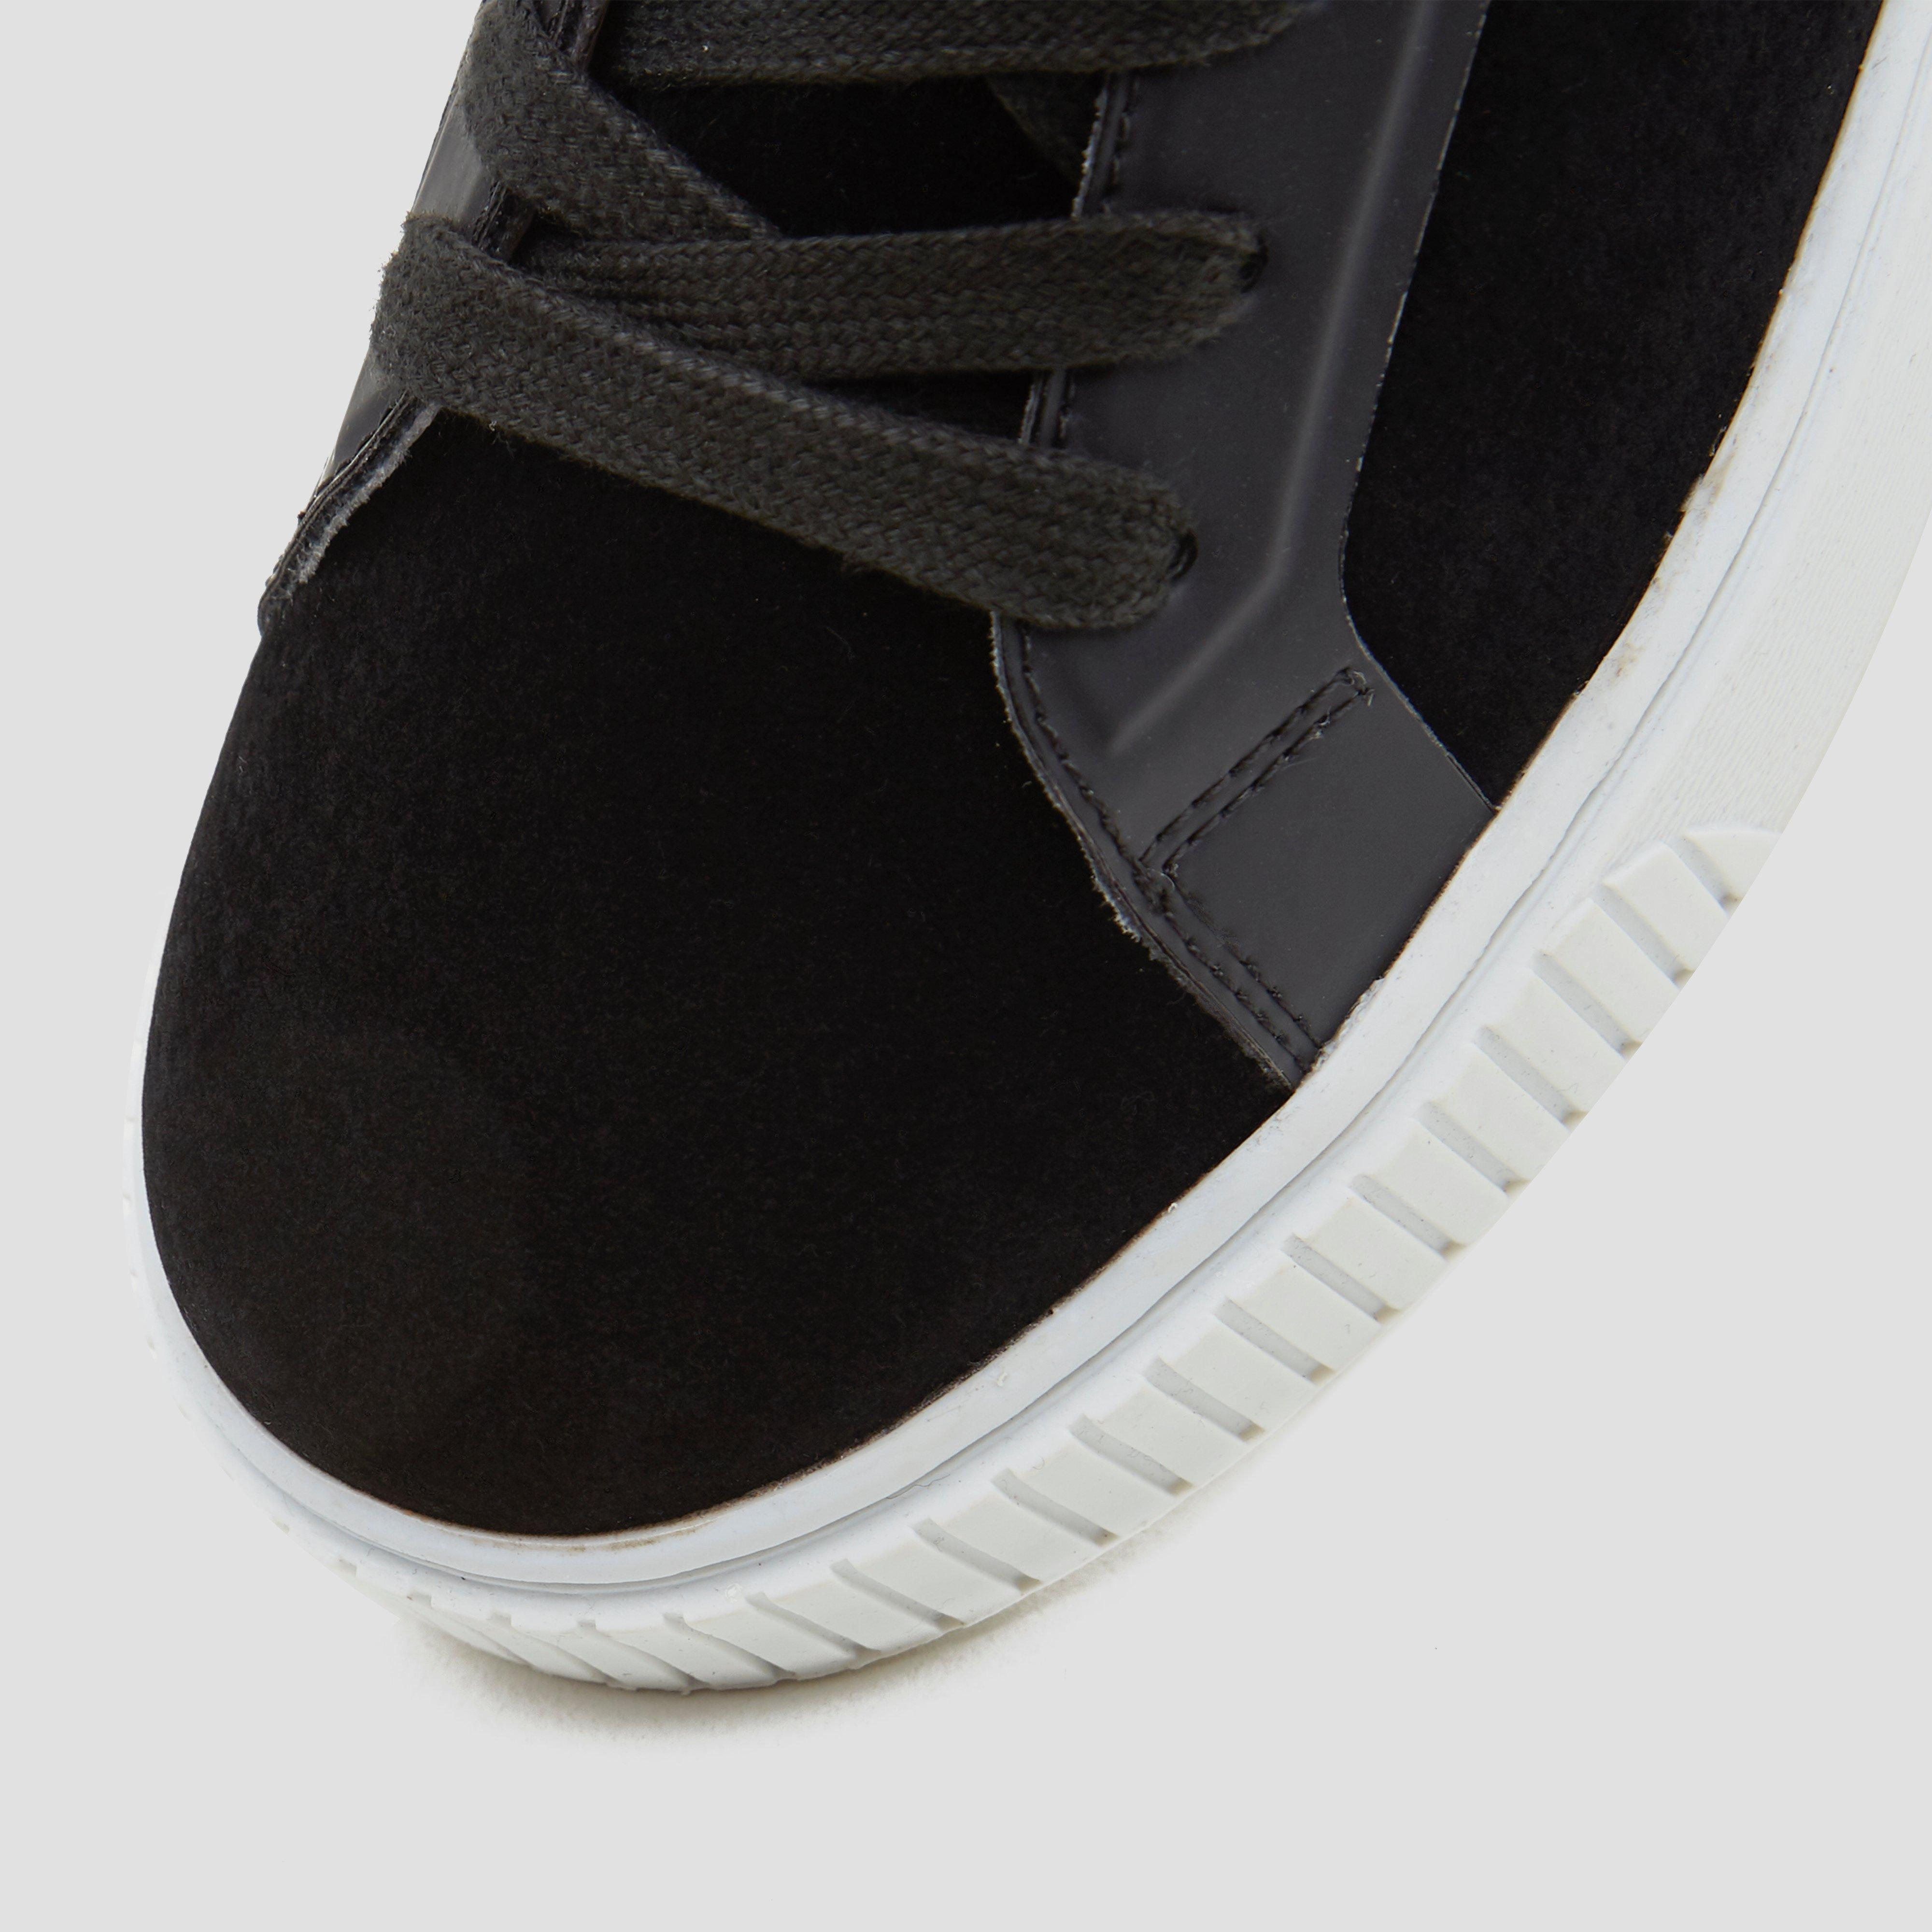 zwarte suede schoenen dames